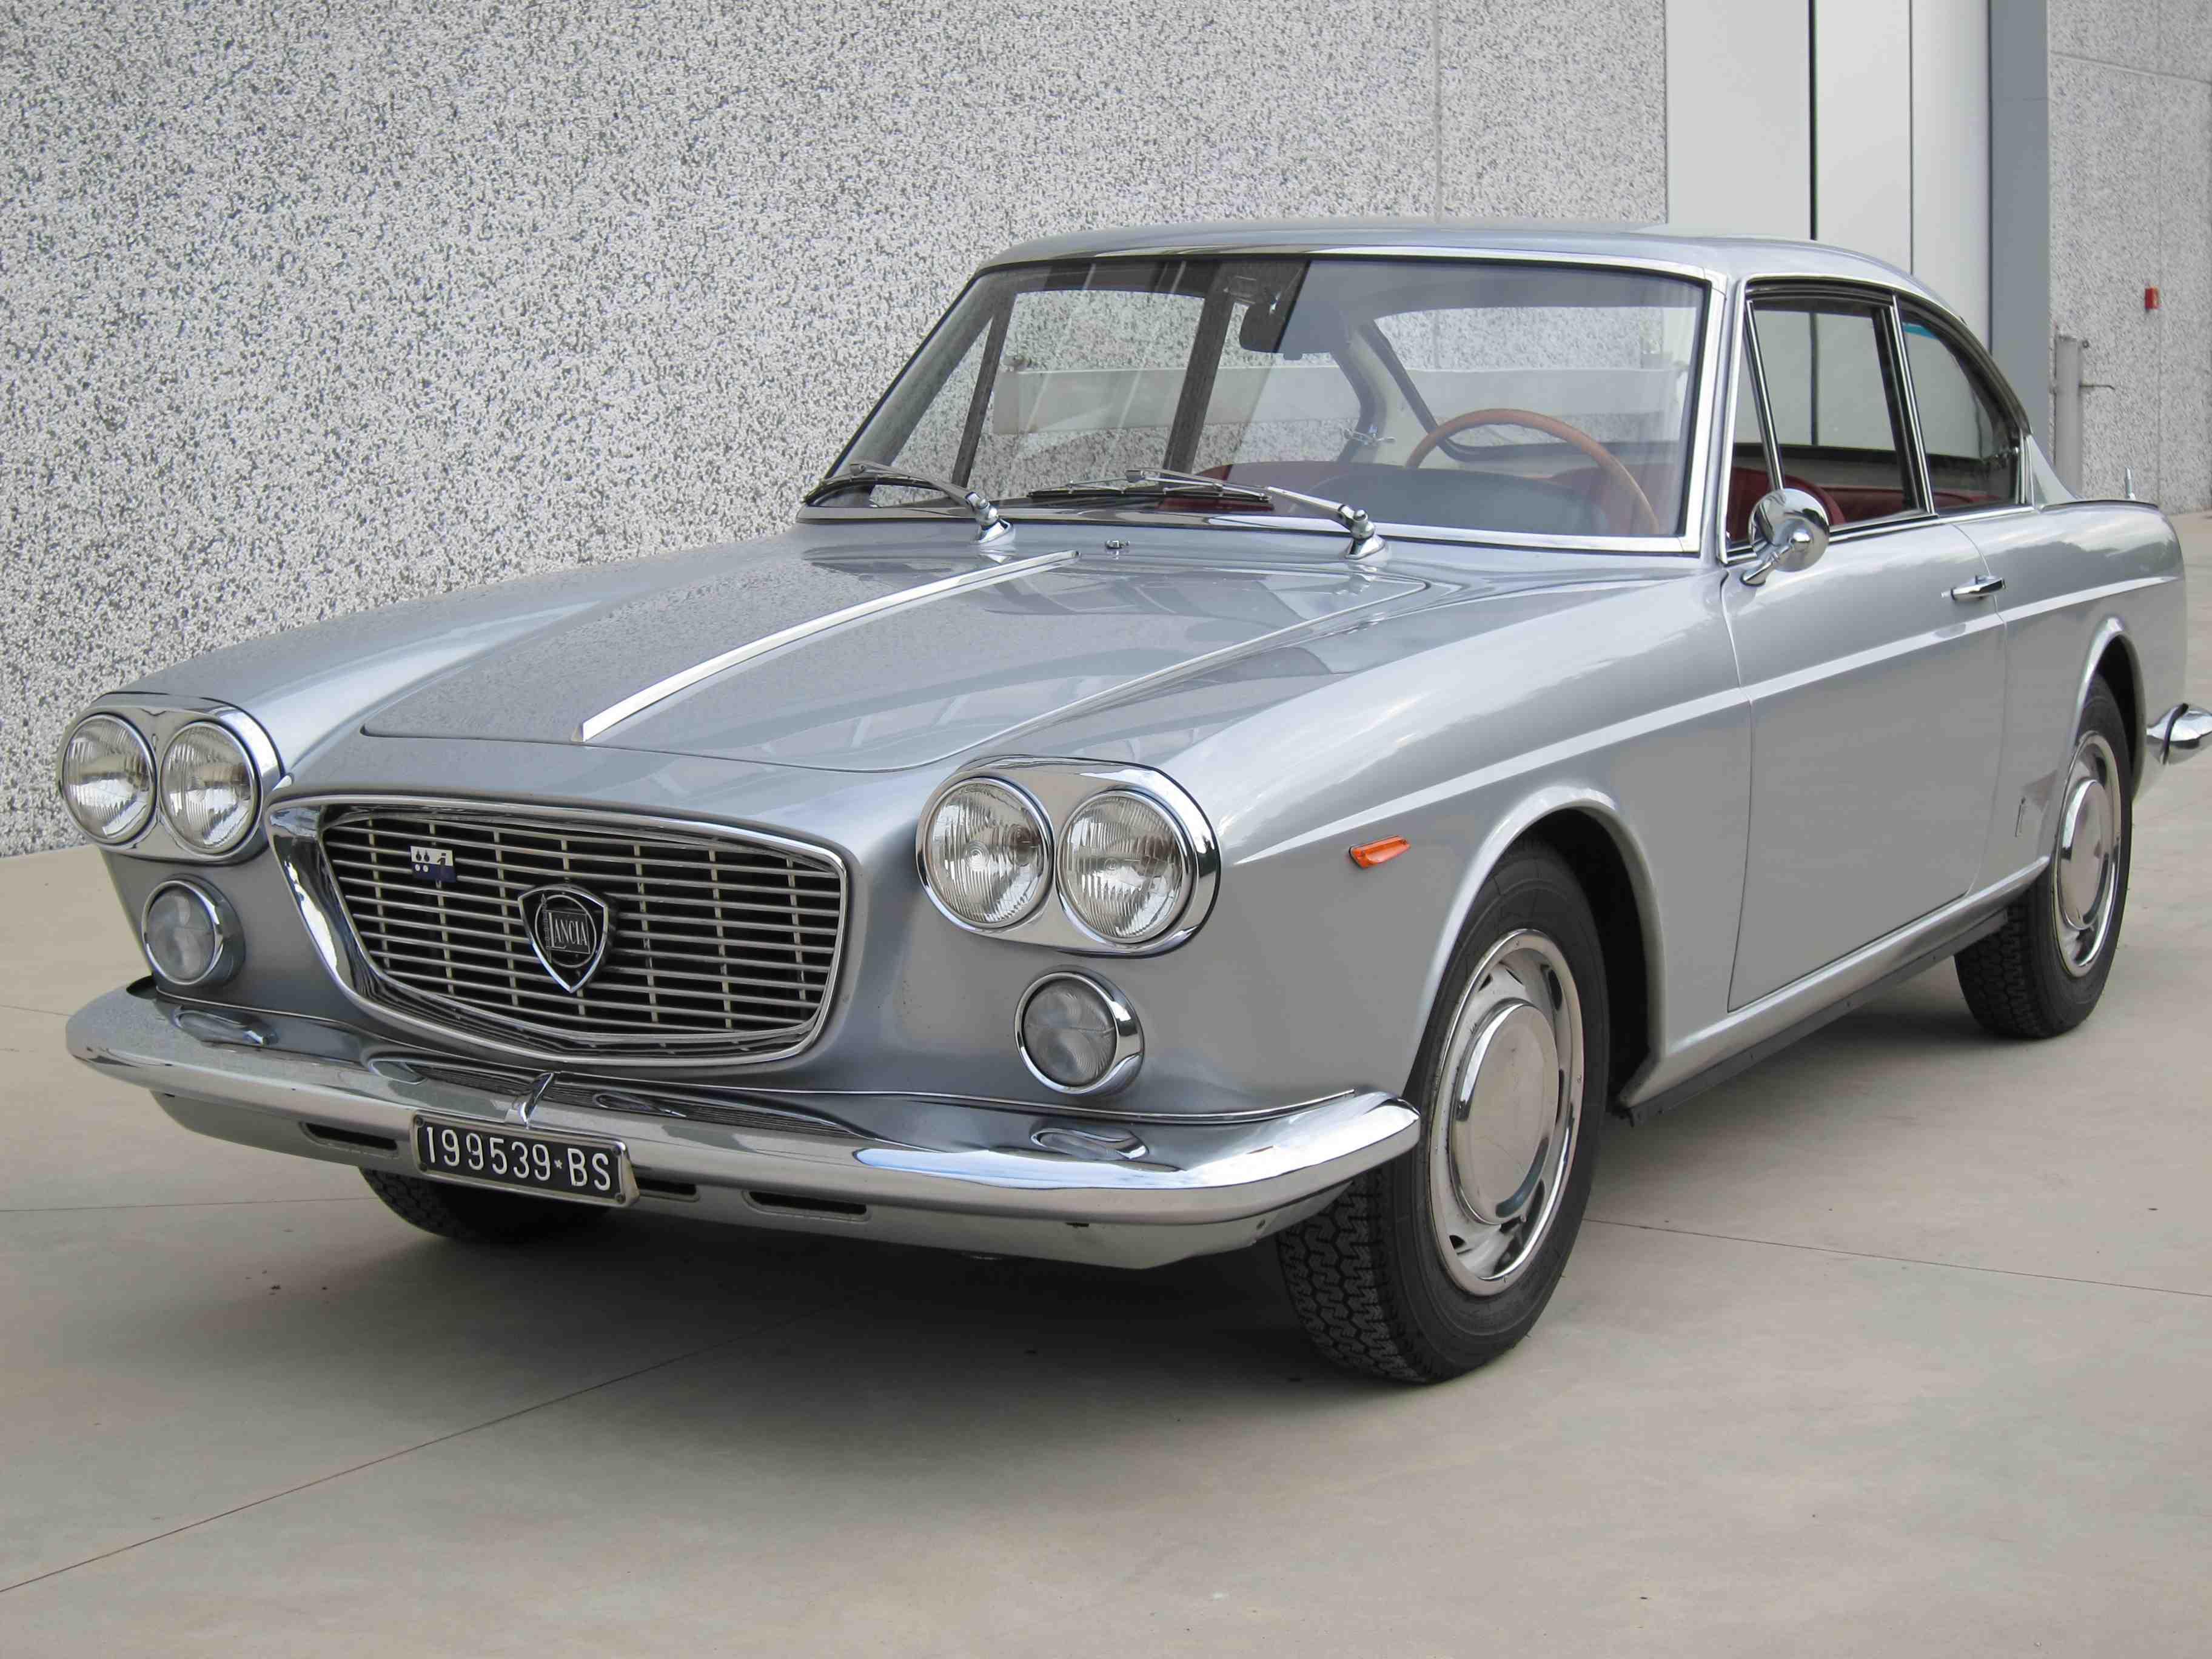 bresciacar classic cars lancia flavia coupe 1800 iniezione year 1967. Black Bedroom Furniture Sets. Home Design Ideas